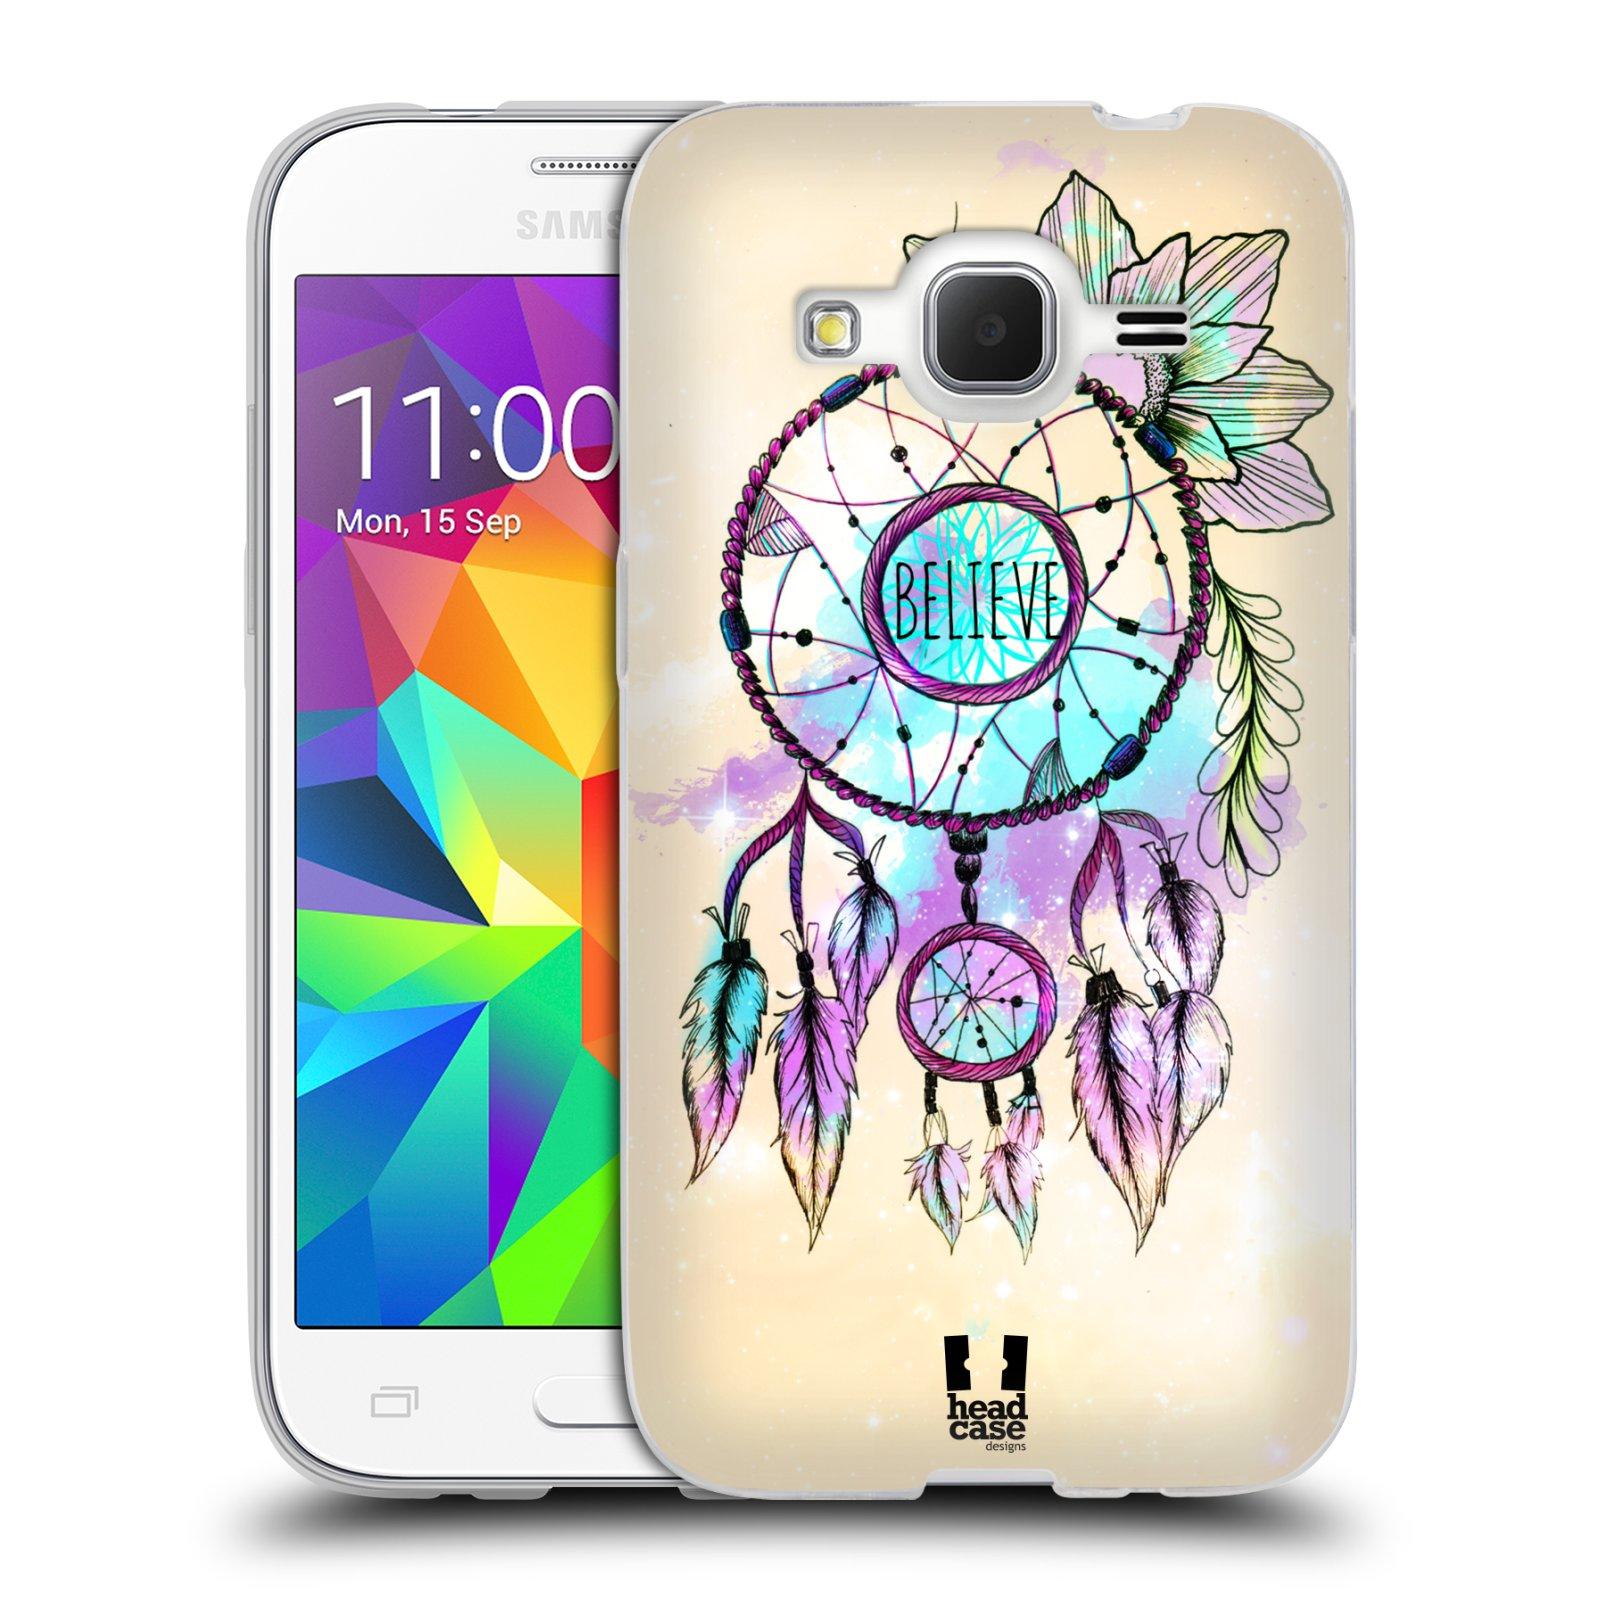 Silikonové pouzdro na mobil Samsung Galaxy Core Prime LTE HEAD CASE MIX BELIEVE